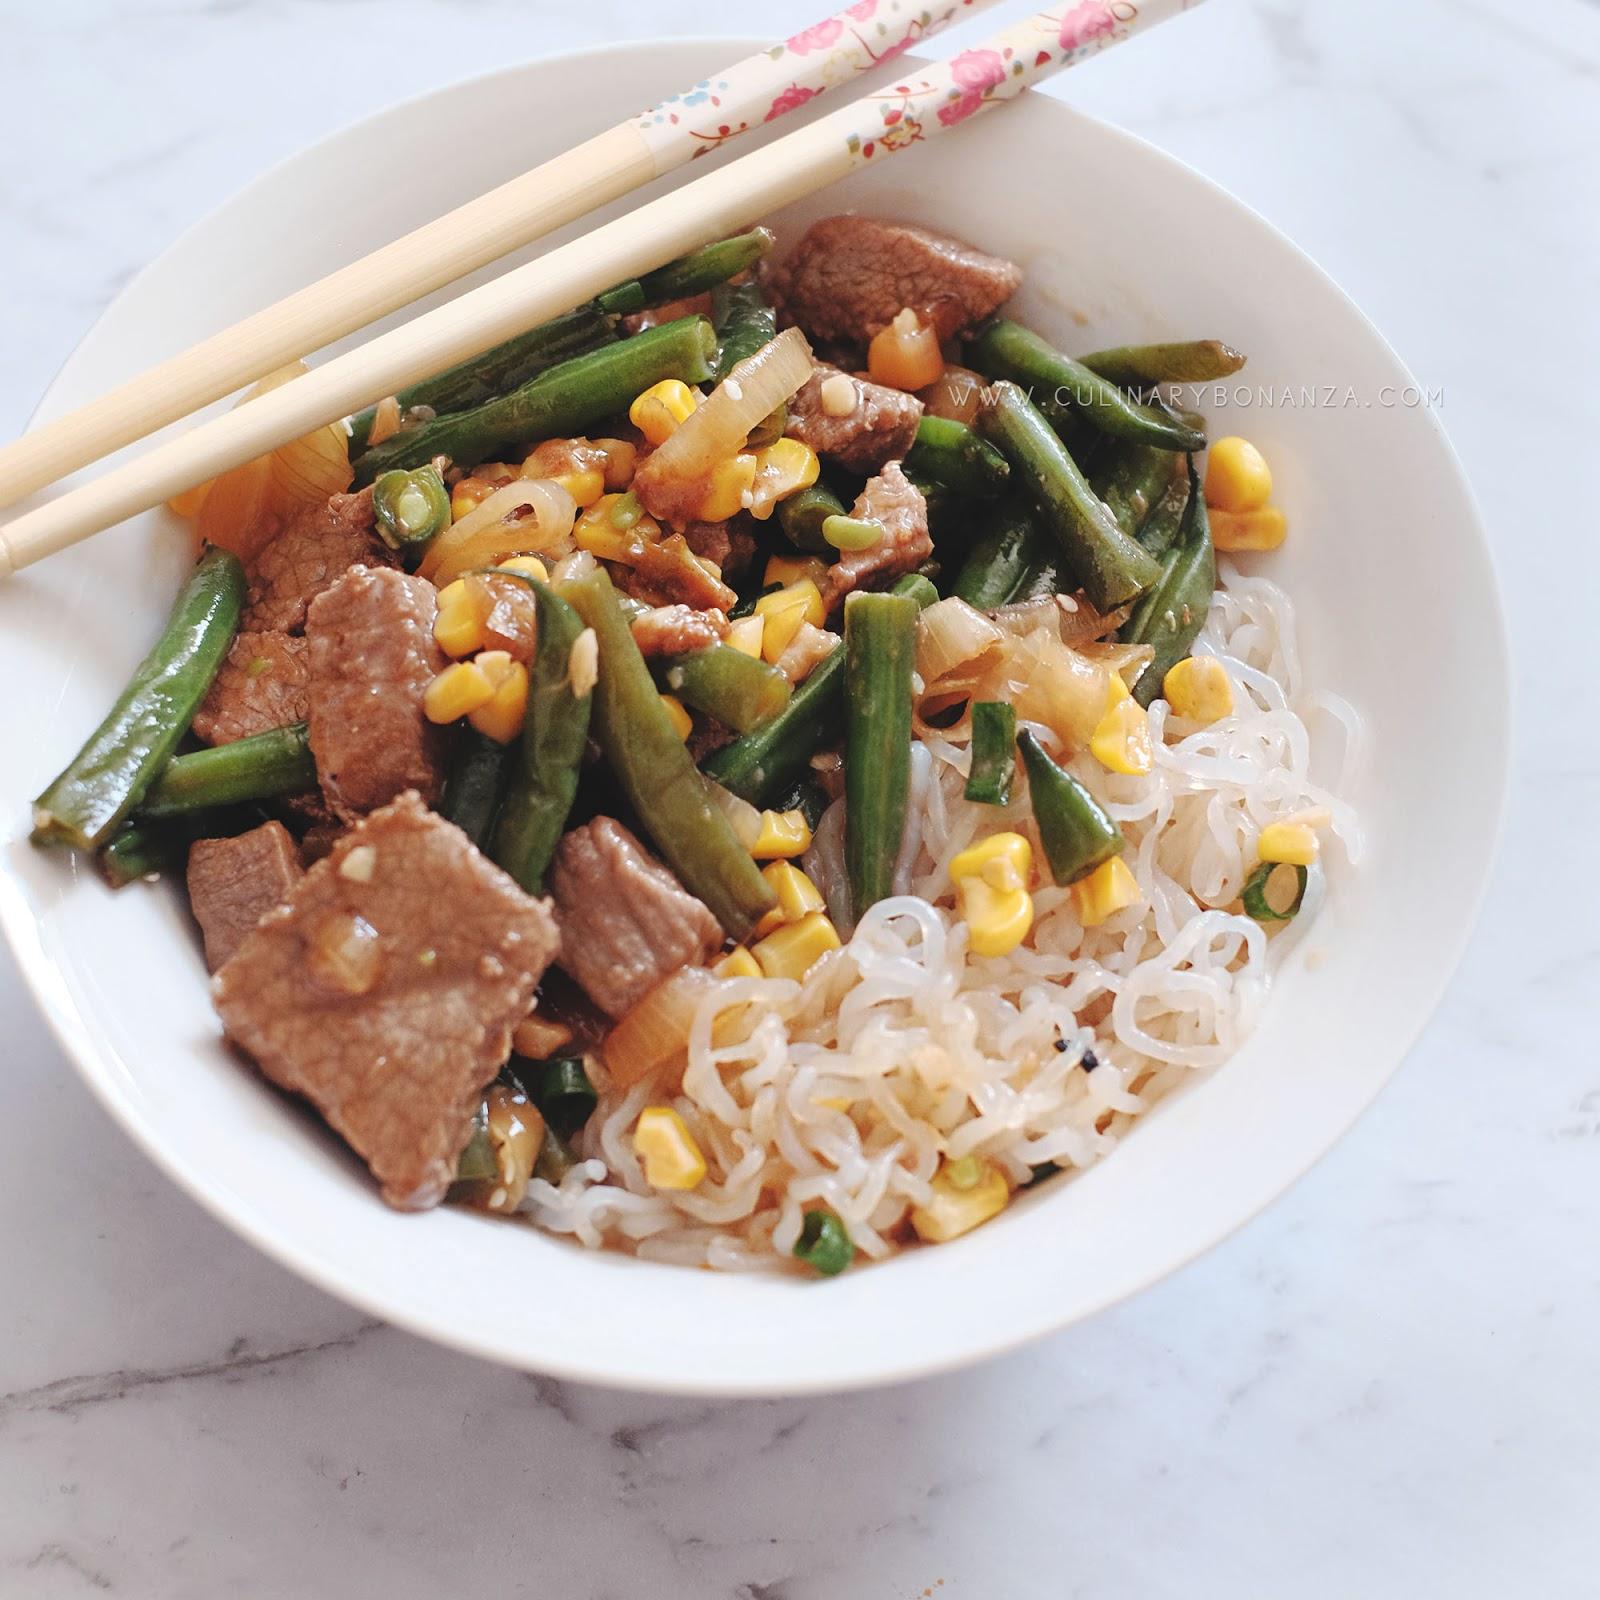 Beef-teriyaki-konjac-noodles-(www.culinarybonanza.com)